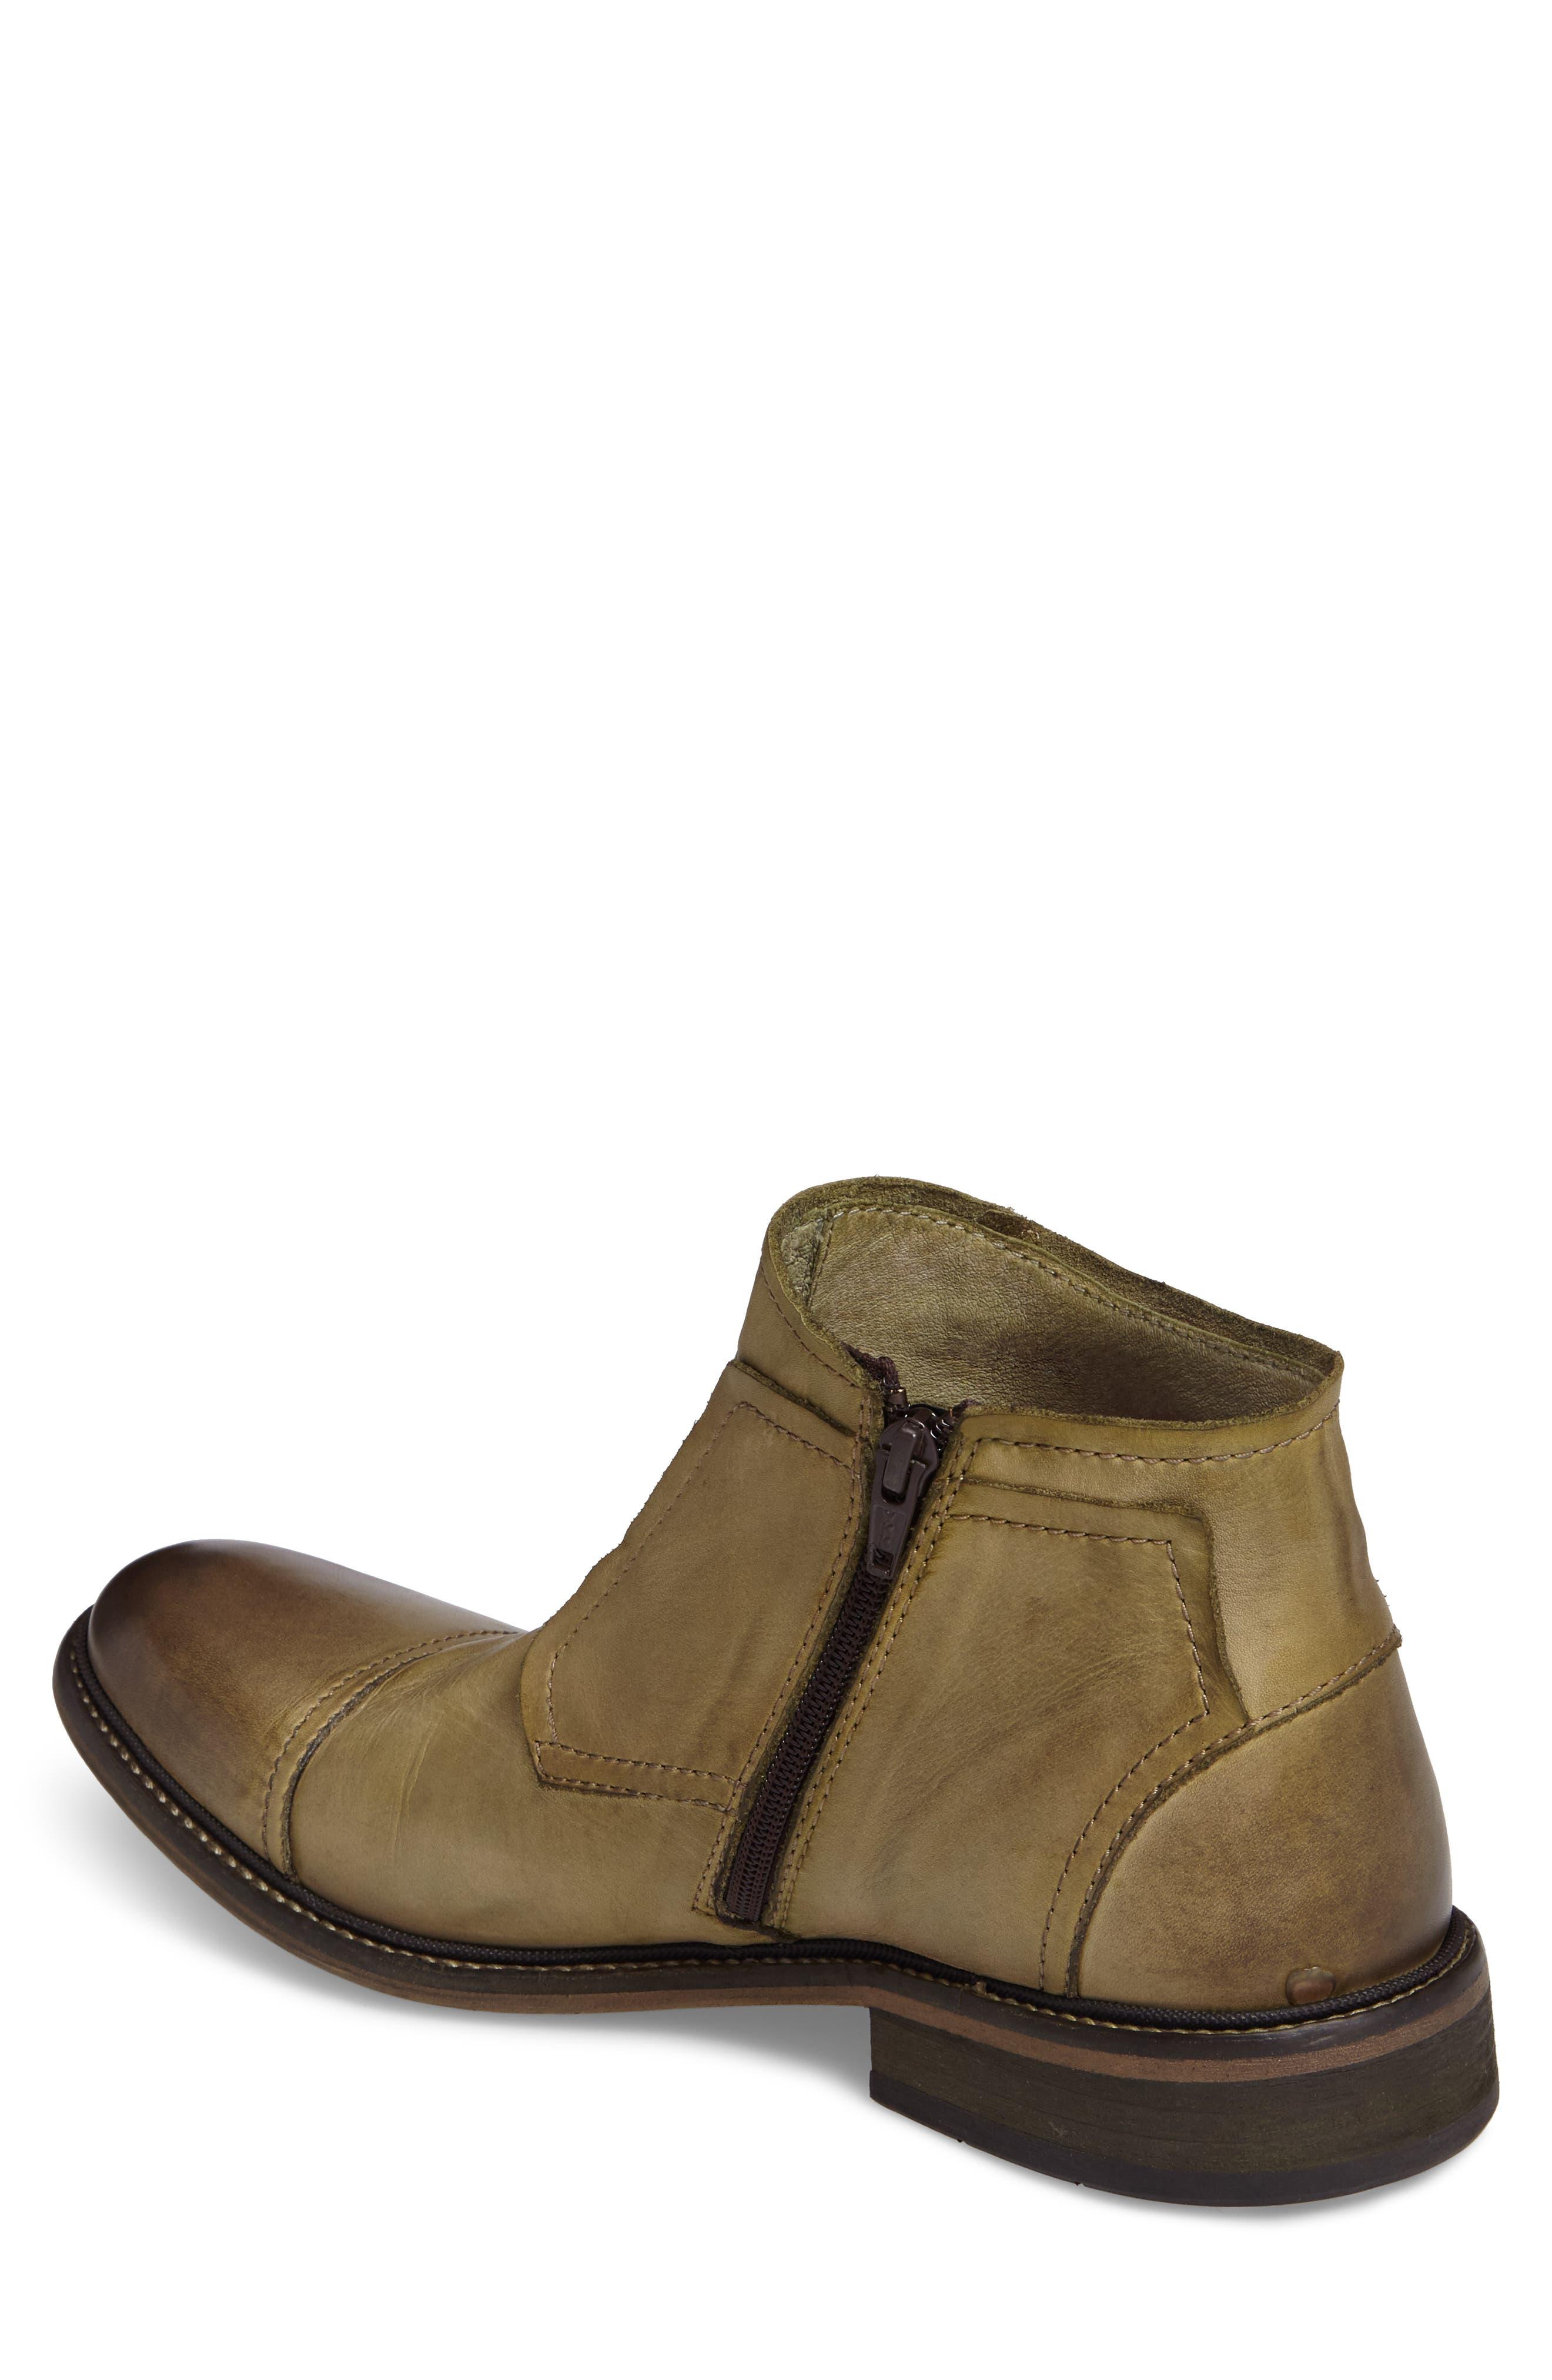 Hale Low Cap Toe Boot,                             Alternate thumbnail 2, color,                             Salvia